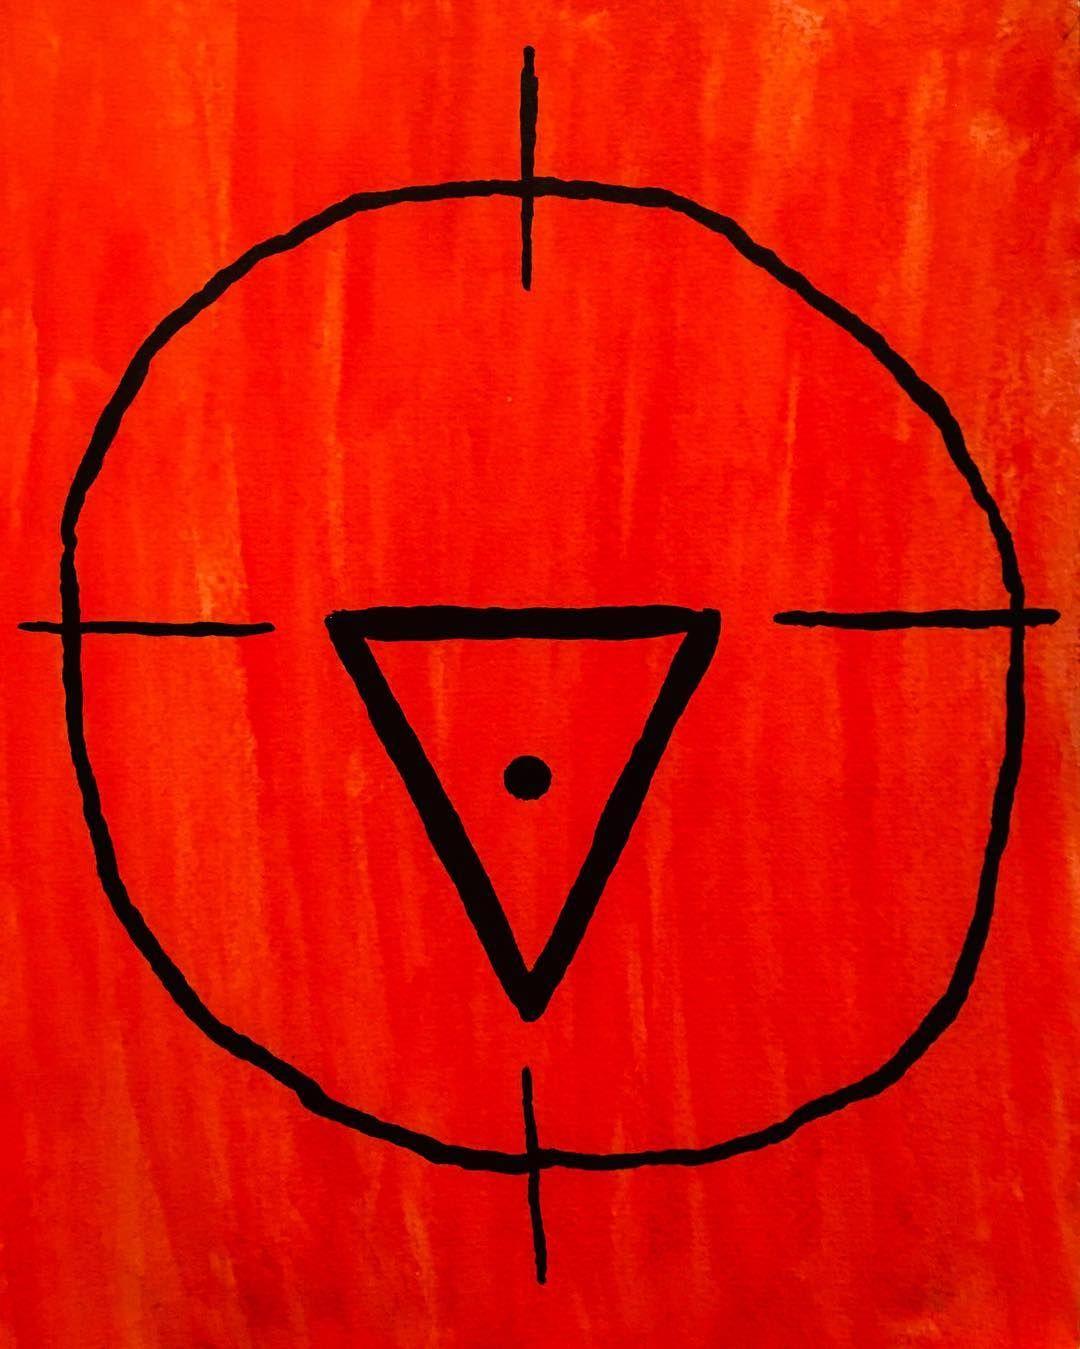 Triangle occult symbol mixedmedia ink black red paint art triangle occult symbol mixedmedia ink black red paint buycottarizona